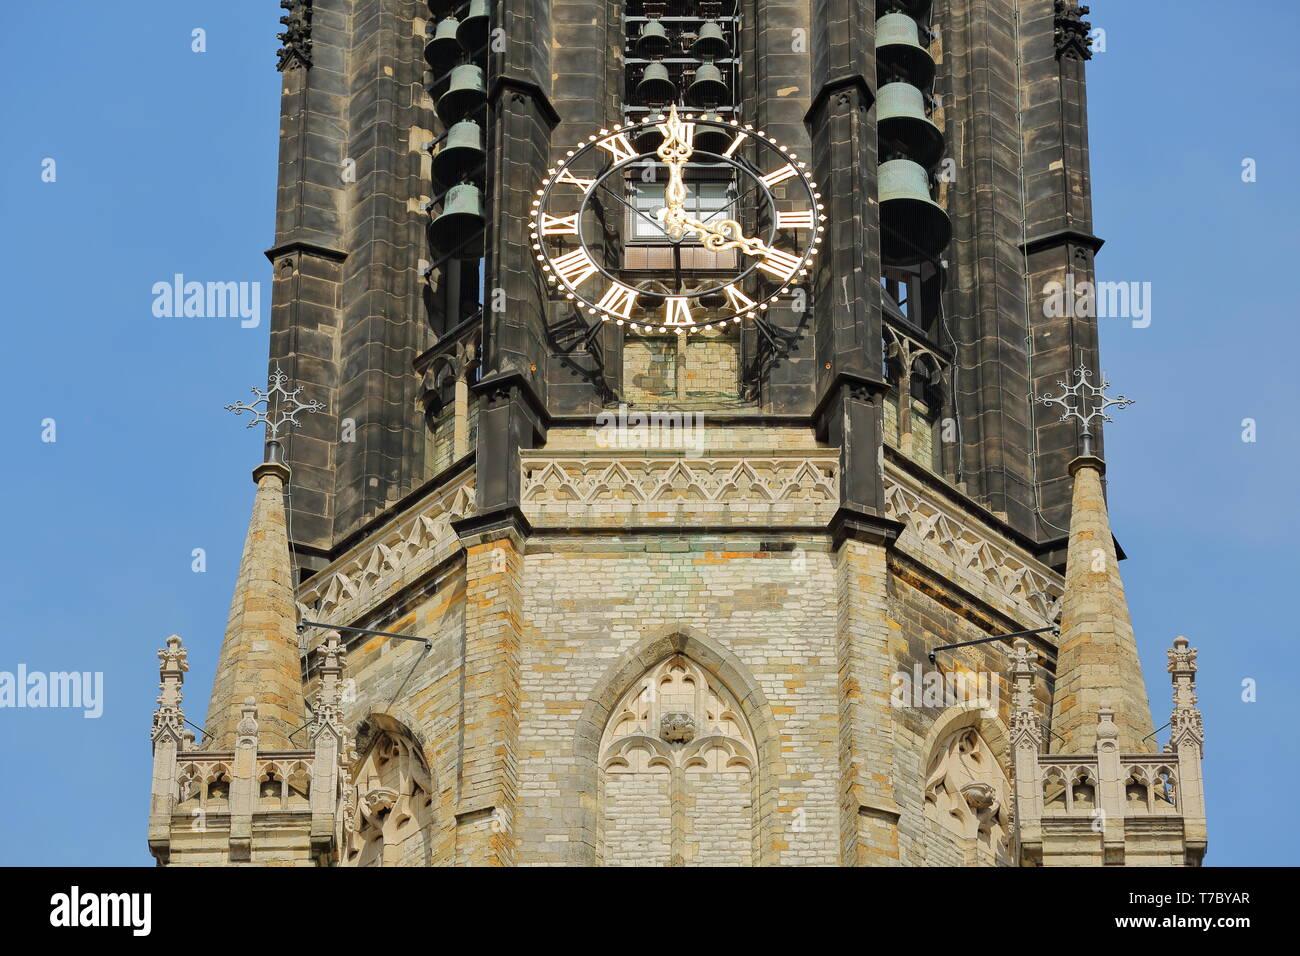 Nieuwe Kerk clock tower: close-up on clock, bells and spires, Delft, Netherlands Stock Photo